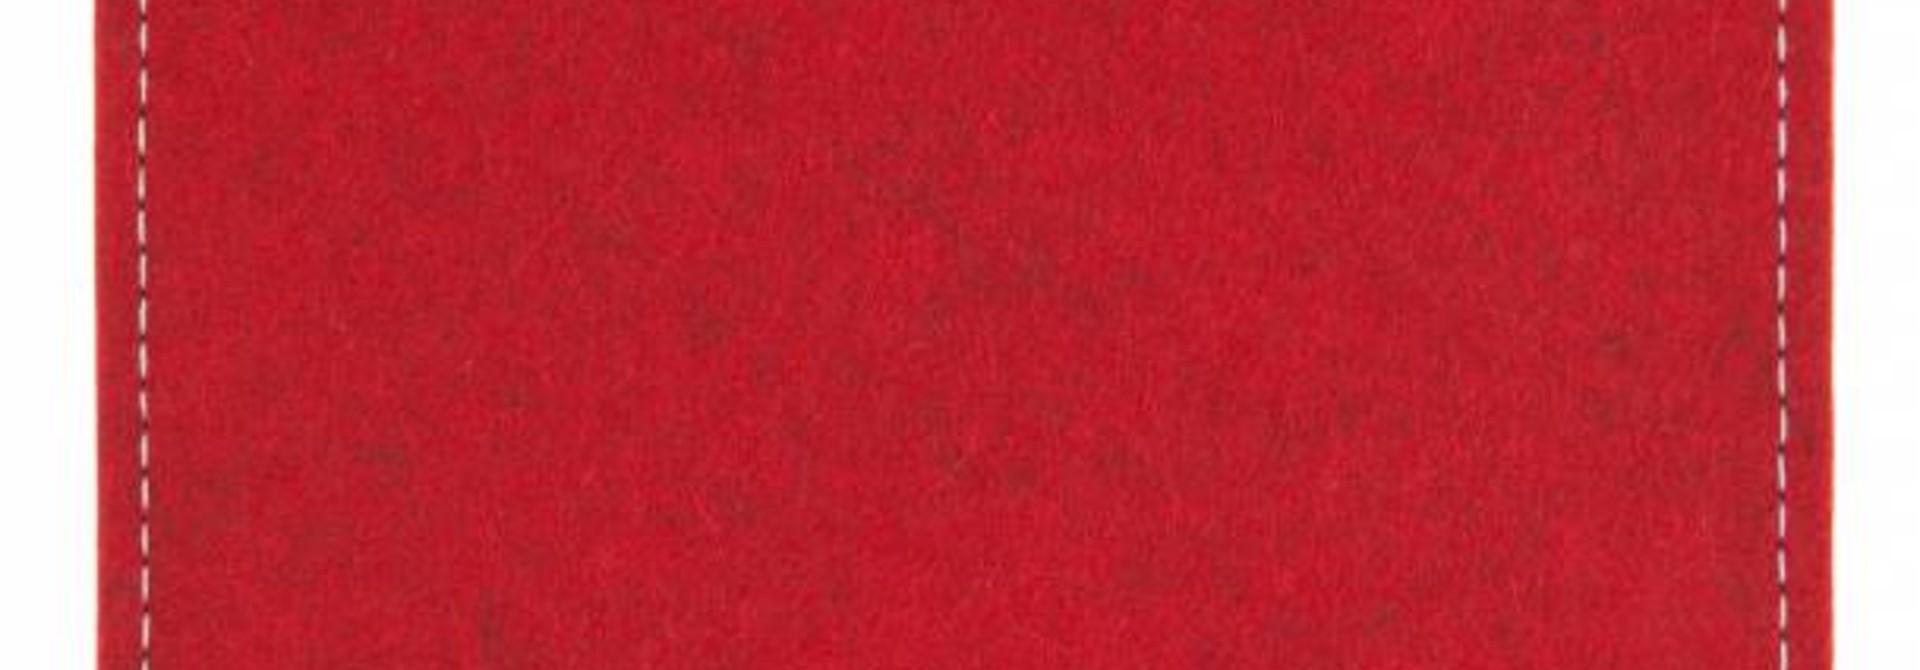 PRS eBook Sleeve Cherry